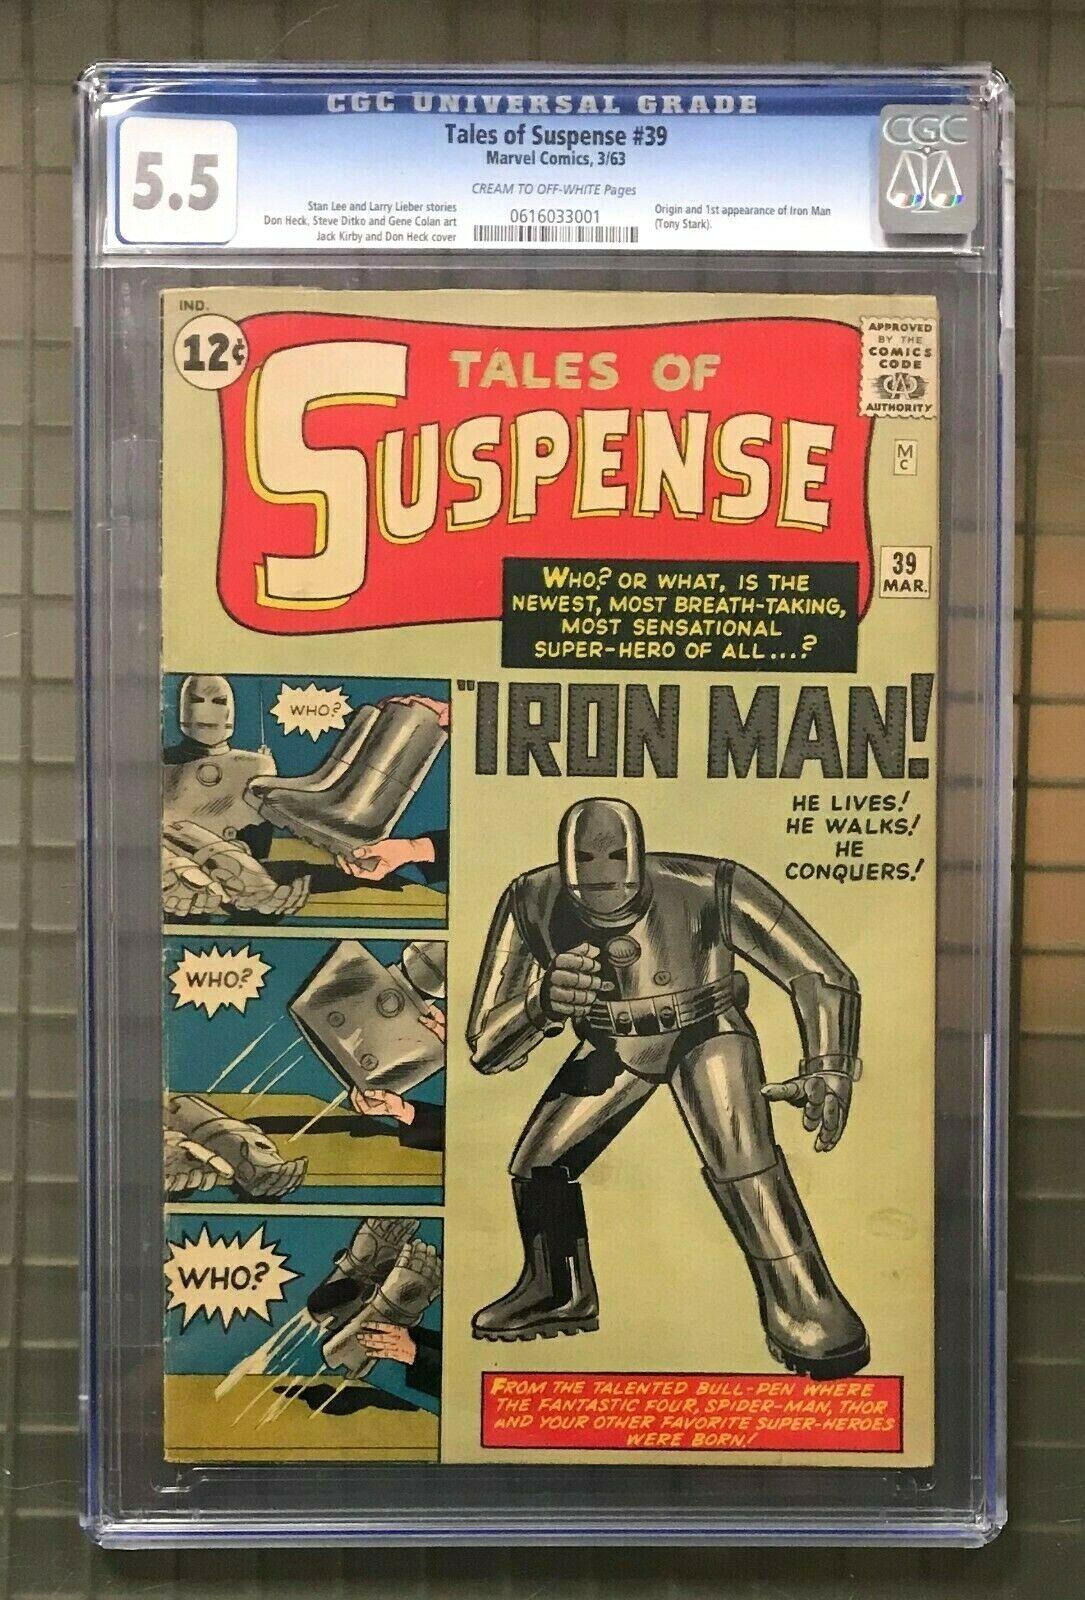 TALES OF SUSPENSE #39 Marvel Comics 1963 CGC 5.5 Iron Man 1st Appearance